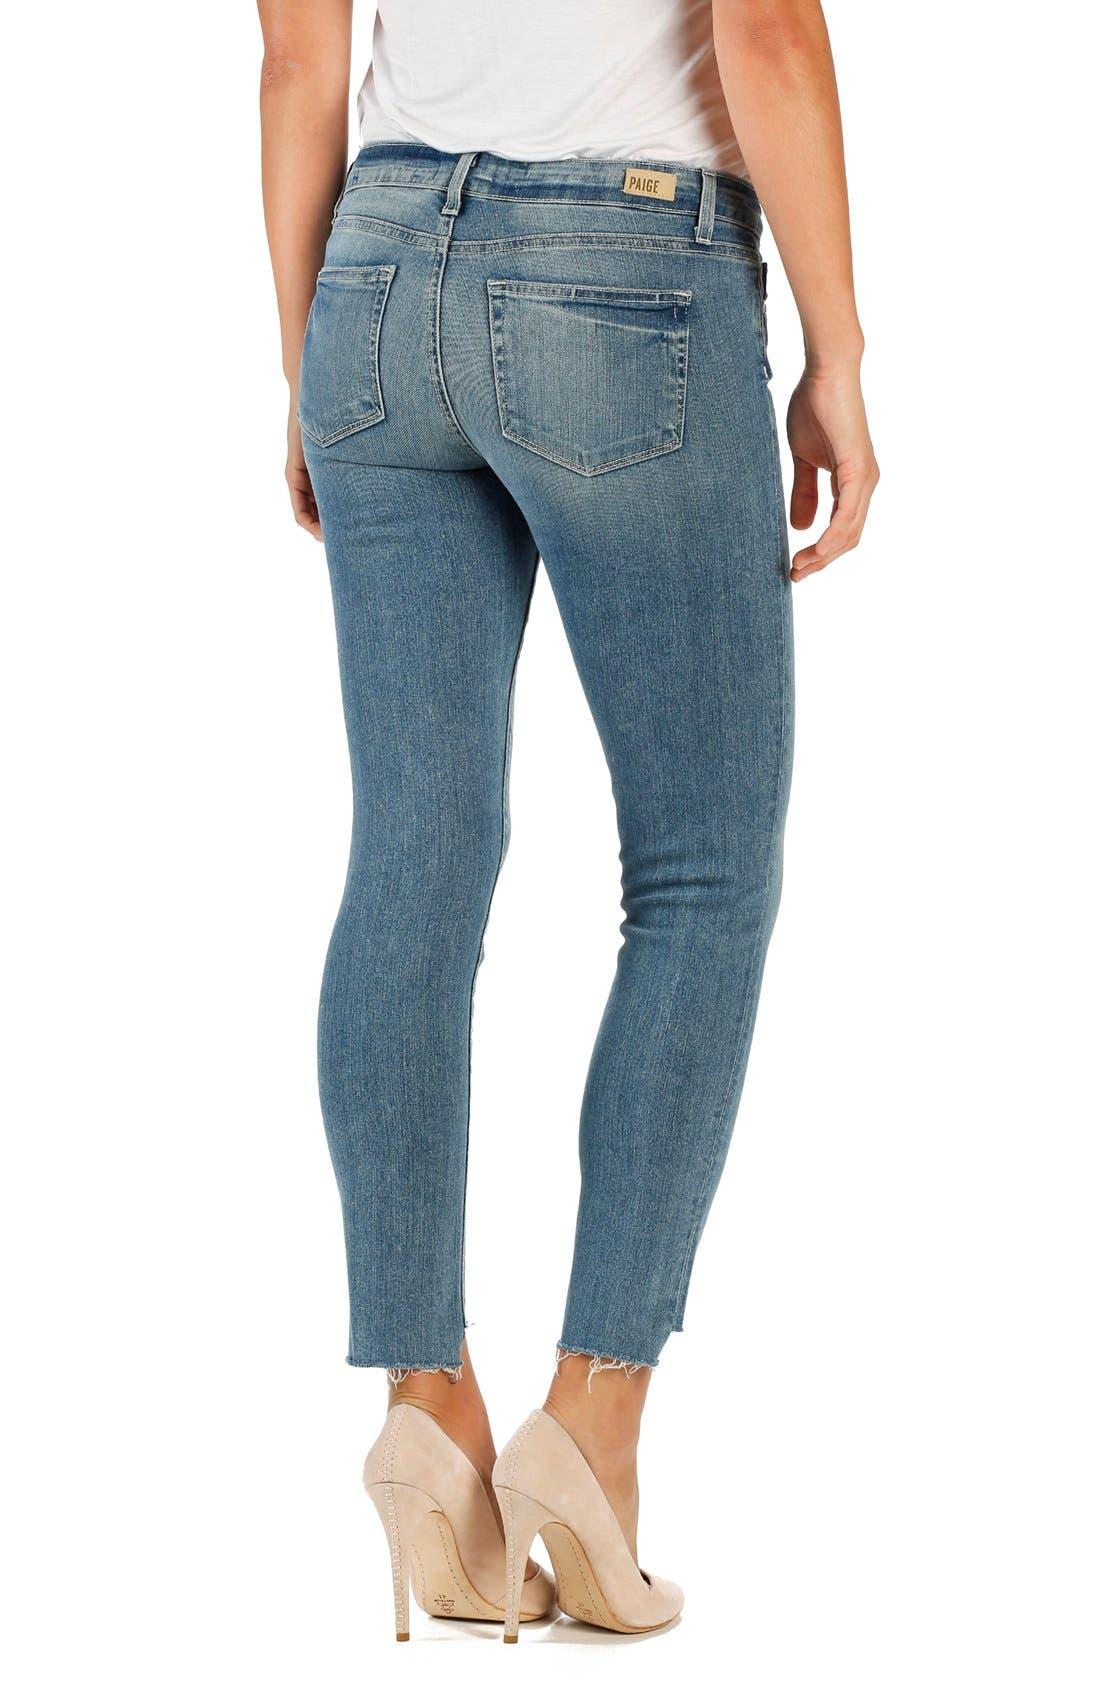 Alternate Image 2  - PAIGE 'Skyline' Cutoff Ankle Peg Skinny Jeans (Wiley)